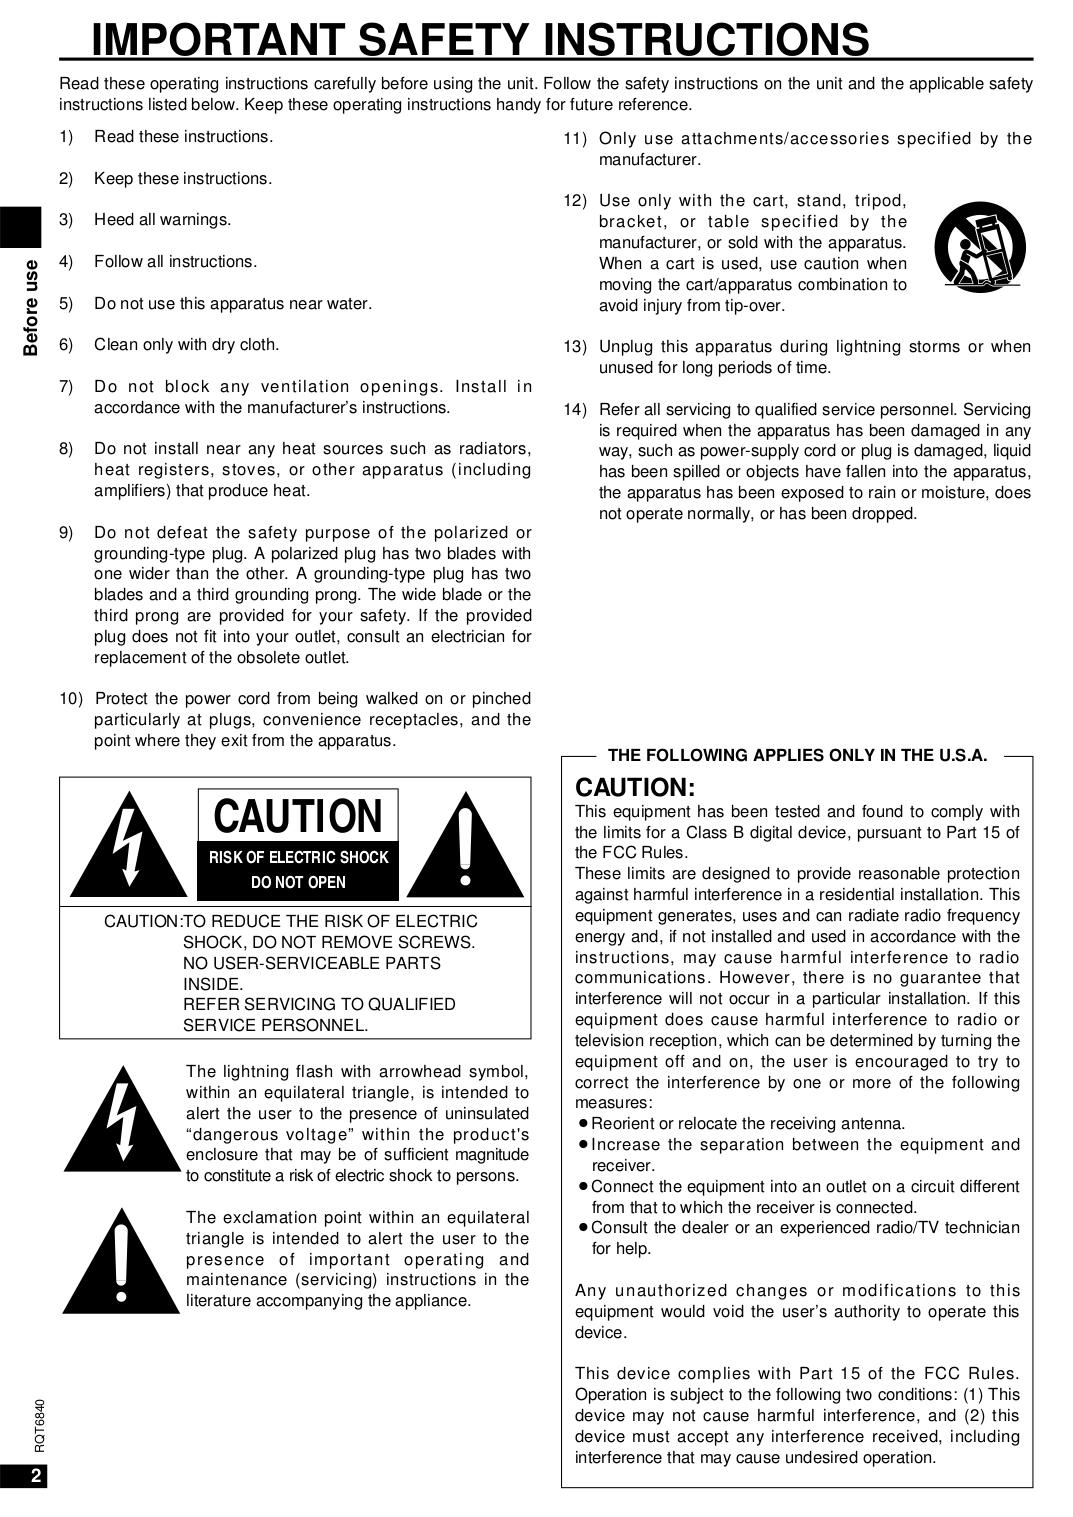 panasonic av-receiver sa-xr25 инструкция